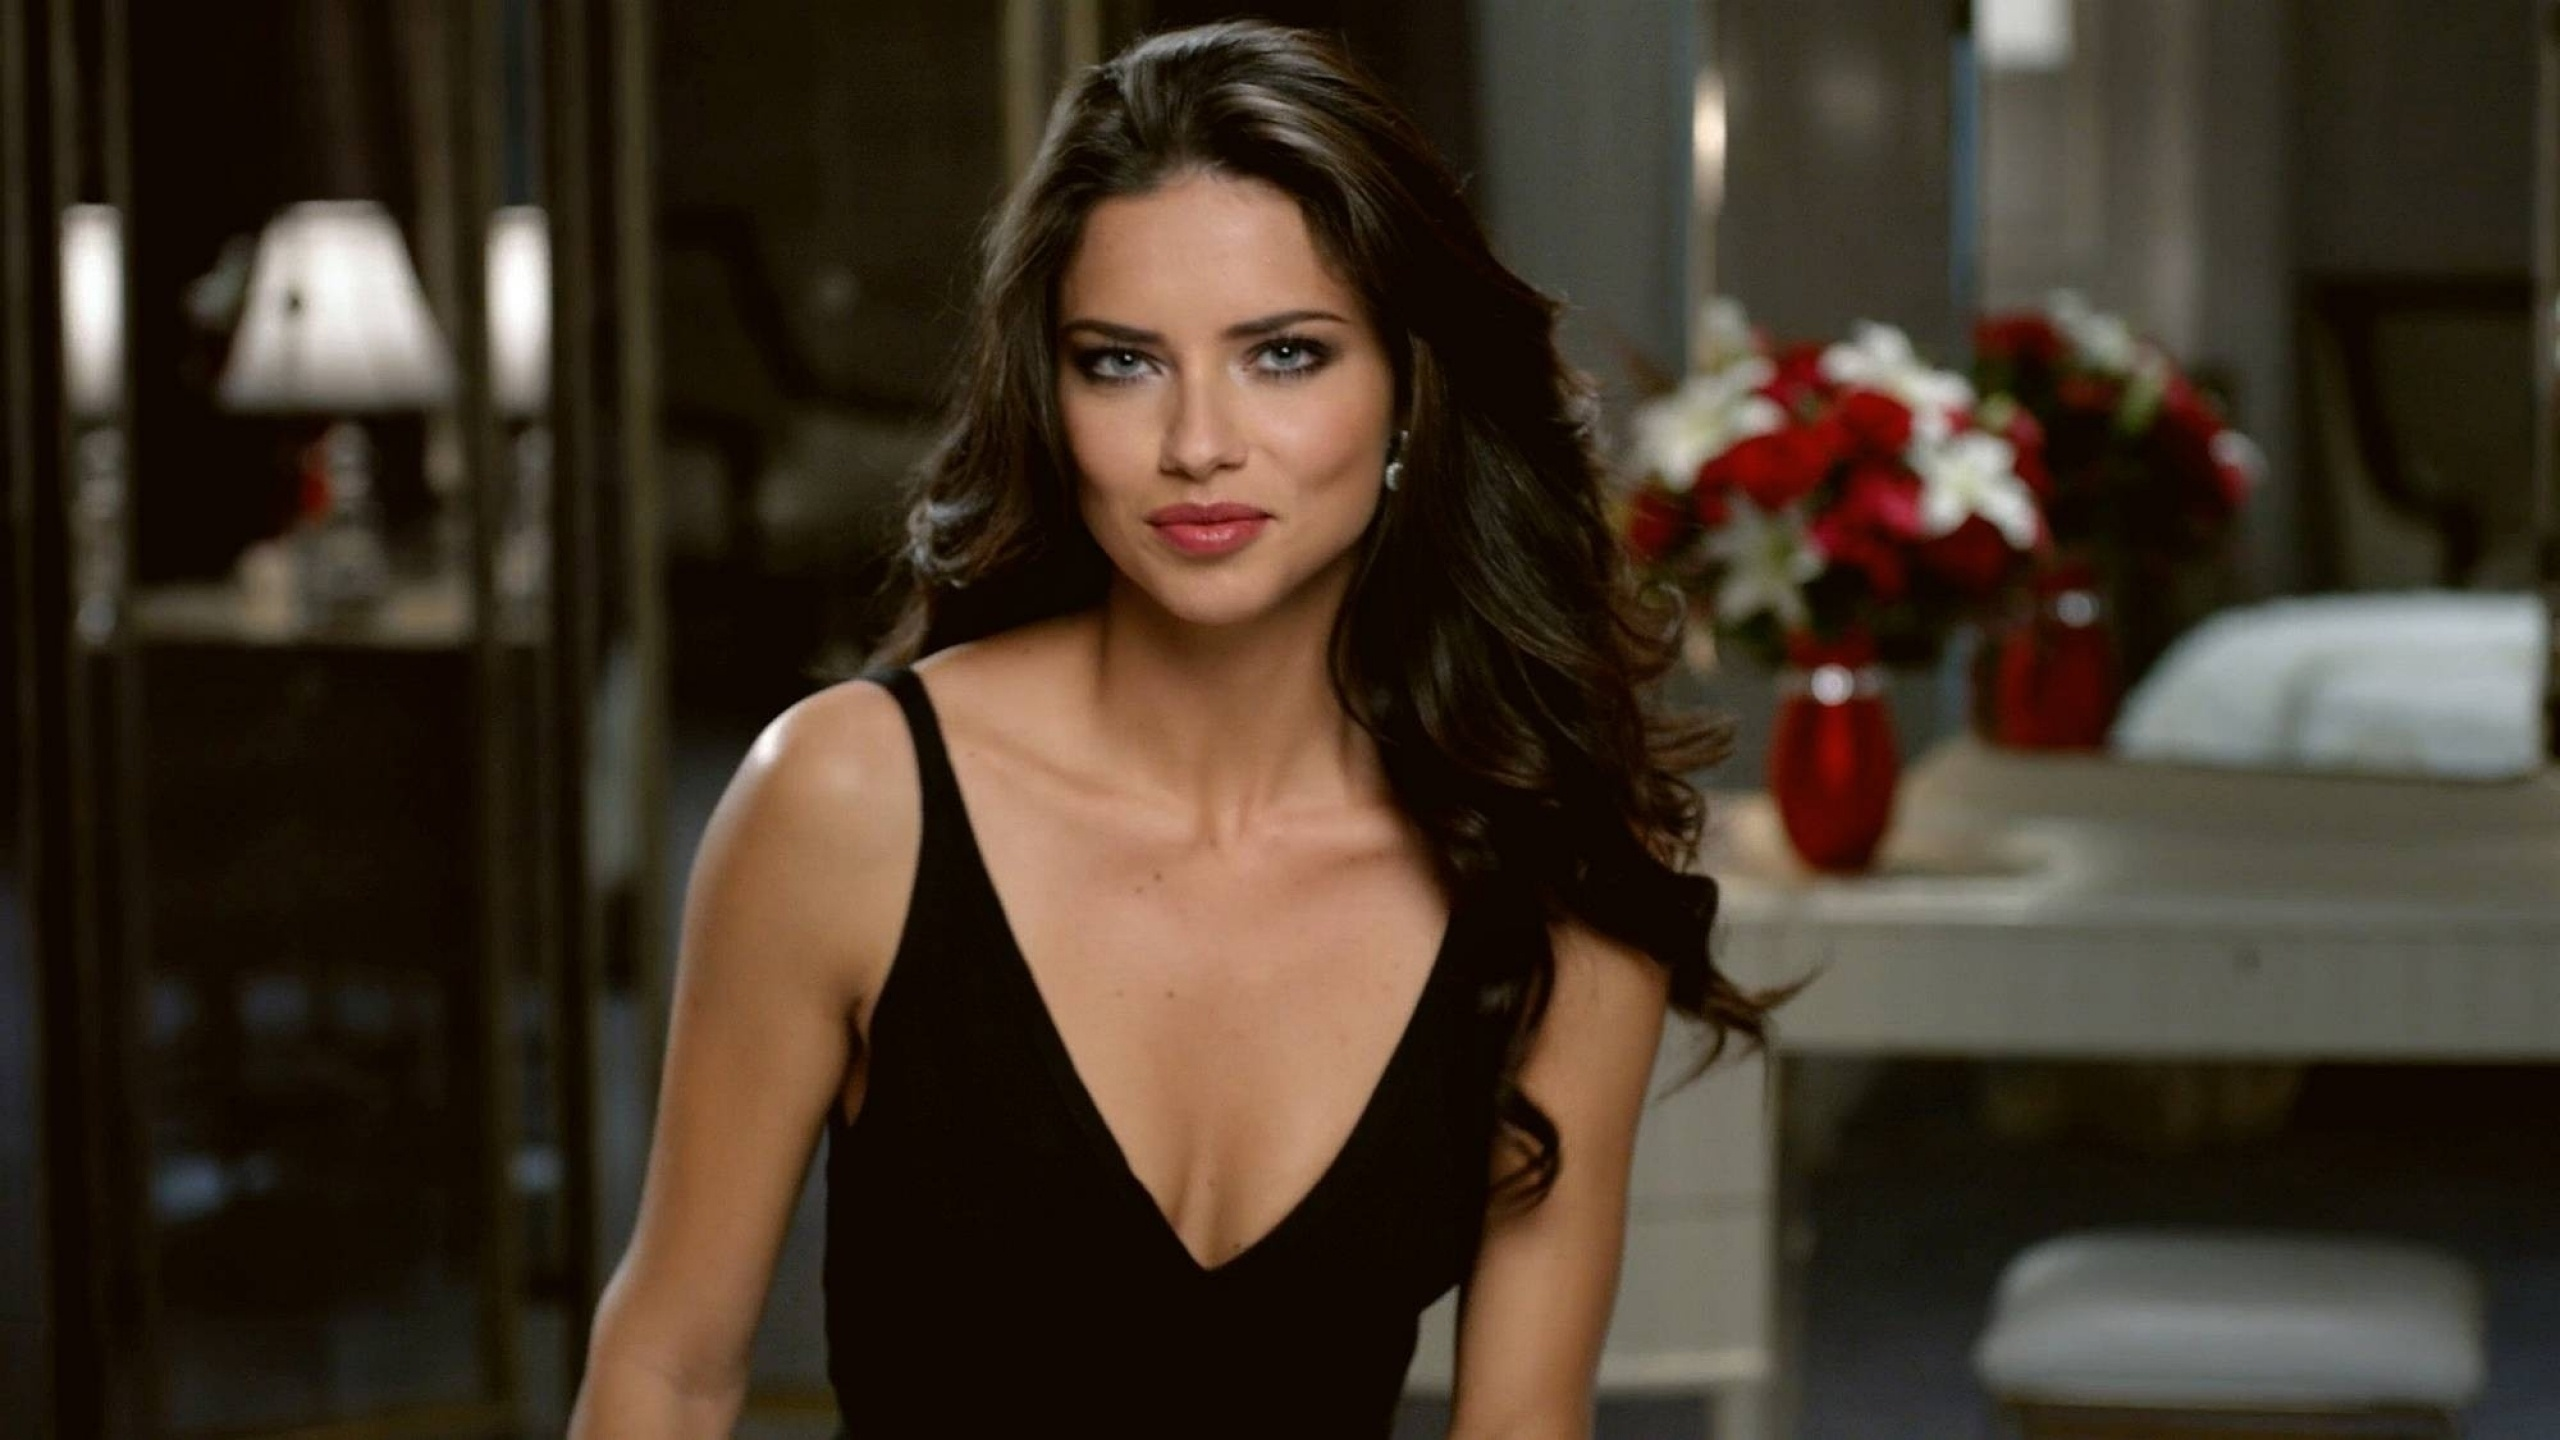 adriana lima, адриана лима, красивая, модель